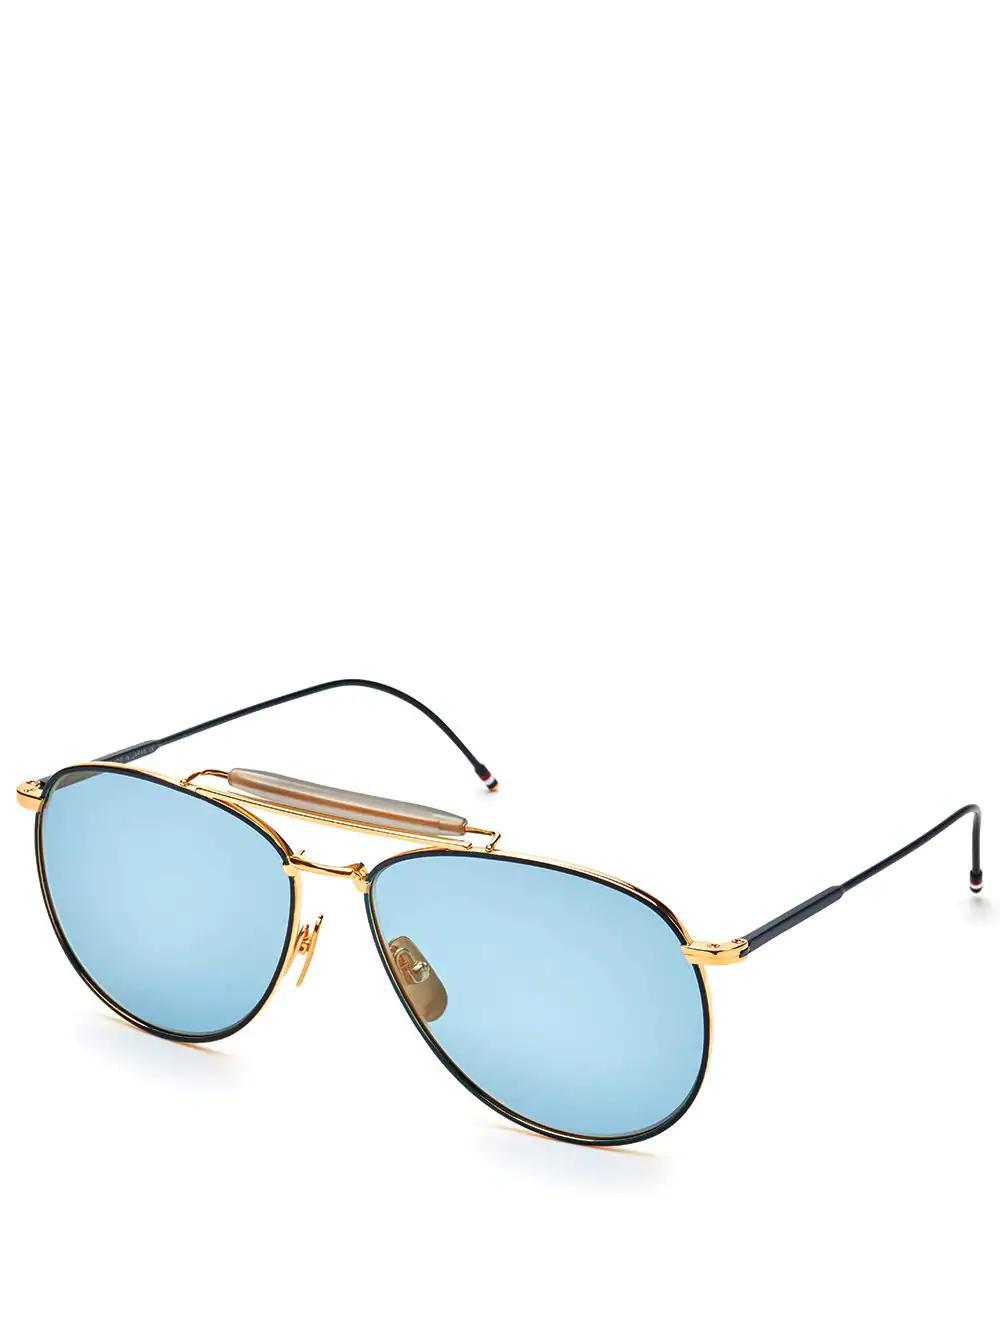 353b61648e88 Thom Browne Eyewear Matte Navy   Yellow Gold Aviator Sunglasses In Blue